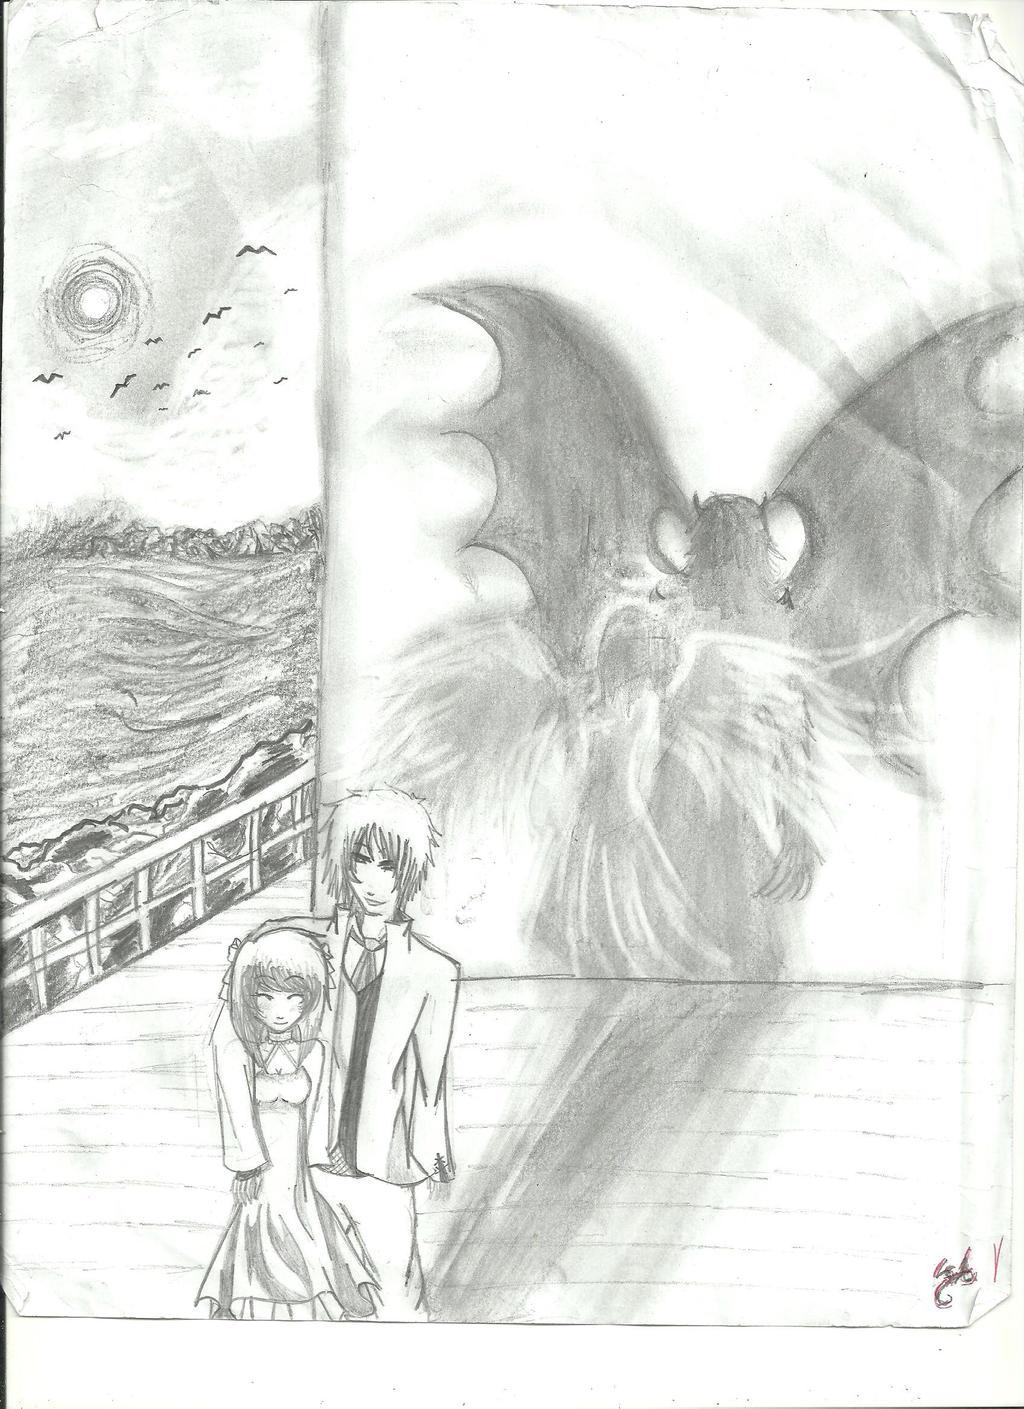 Angel y demonio 1 by Saki-Akihiko